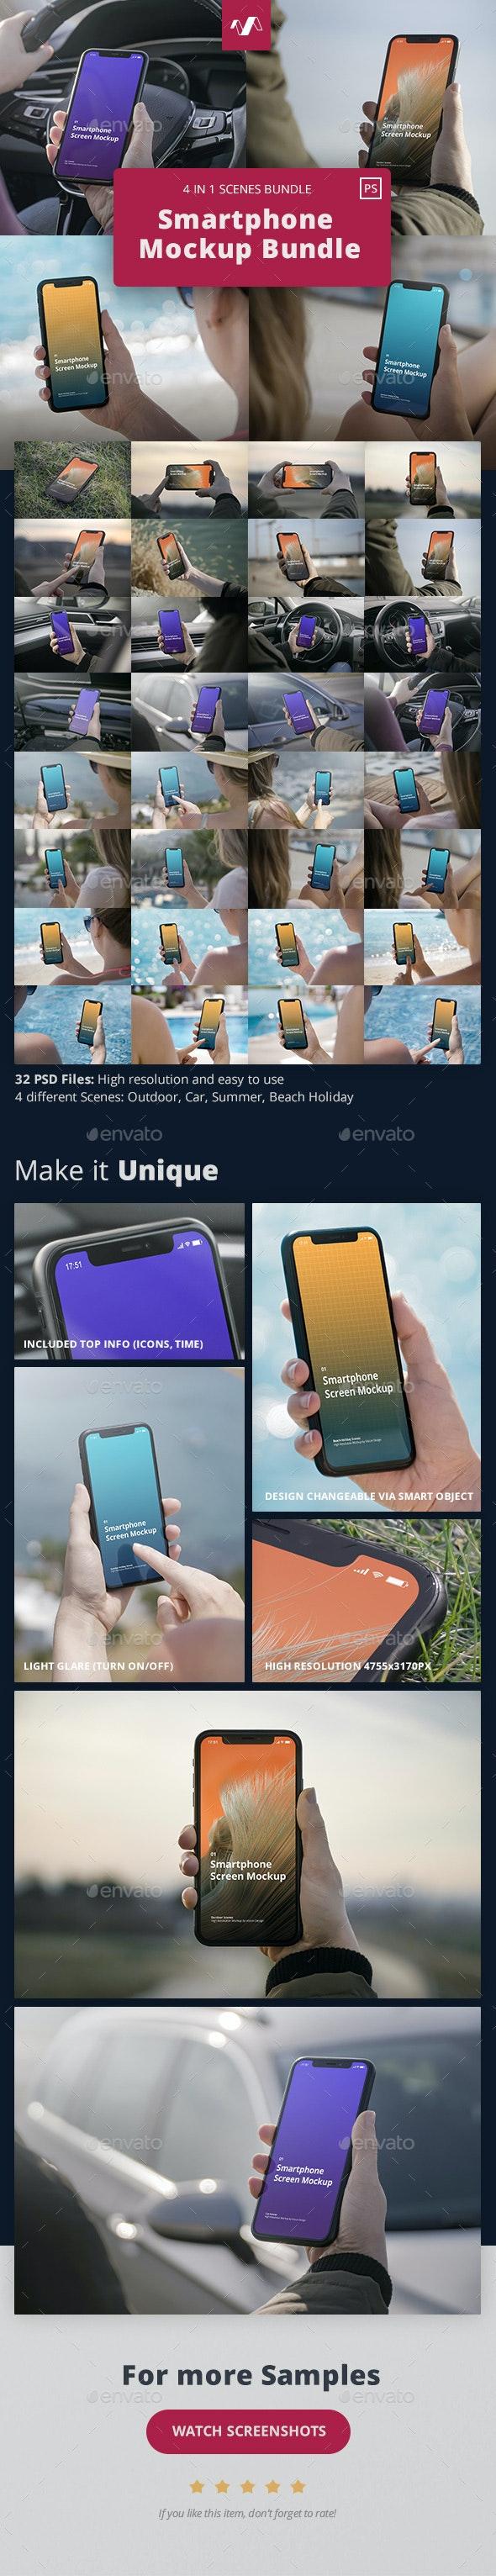 Phone Mockup Scenes Bundle - Mobile Displays